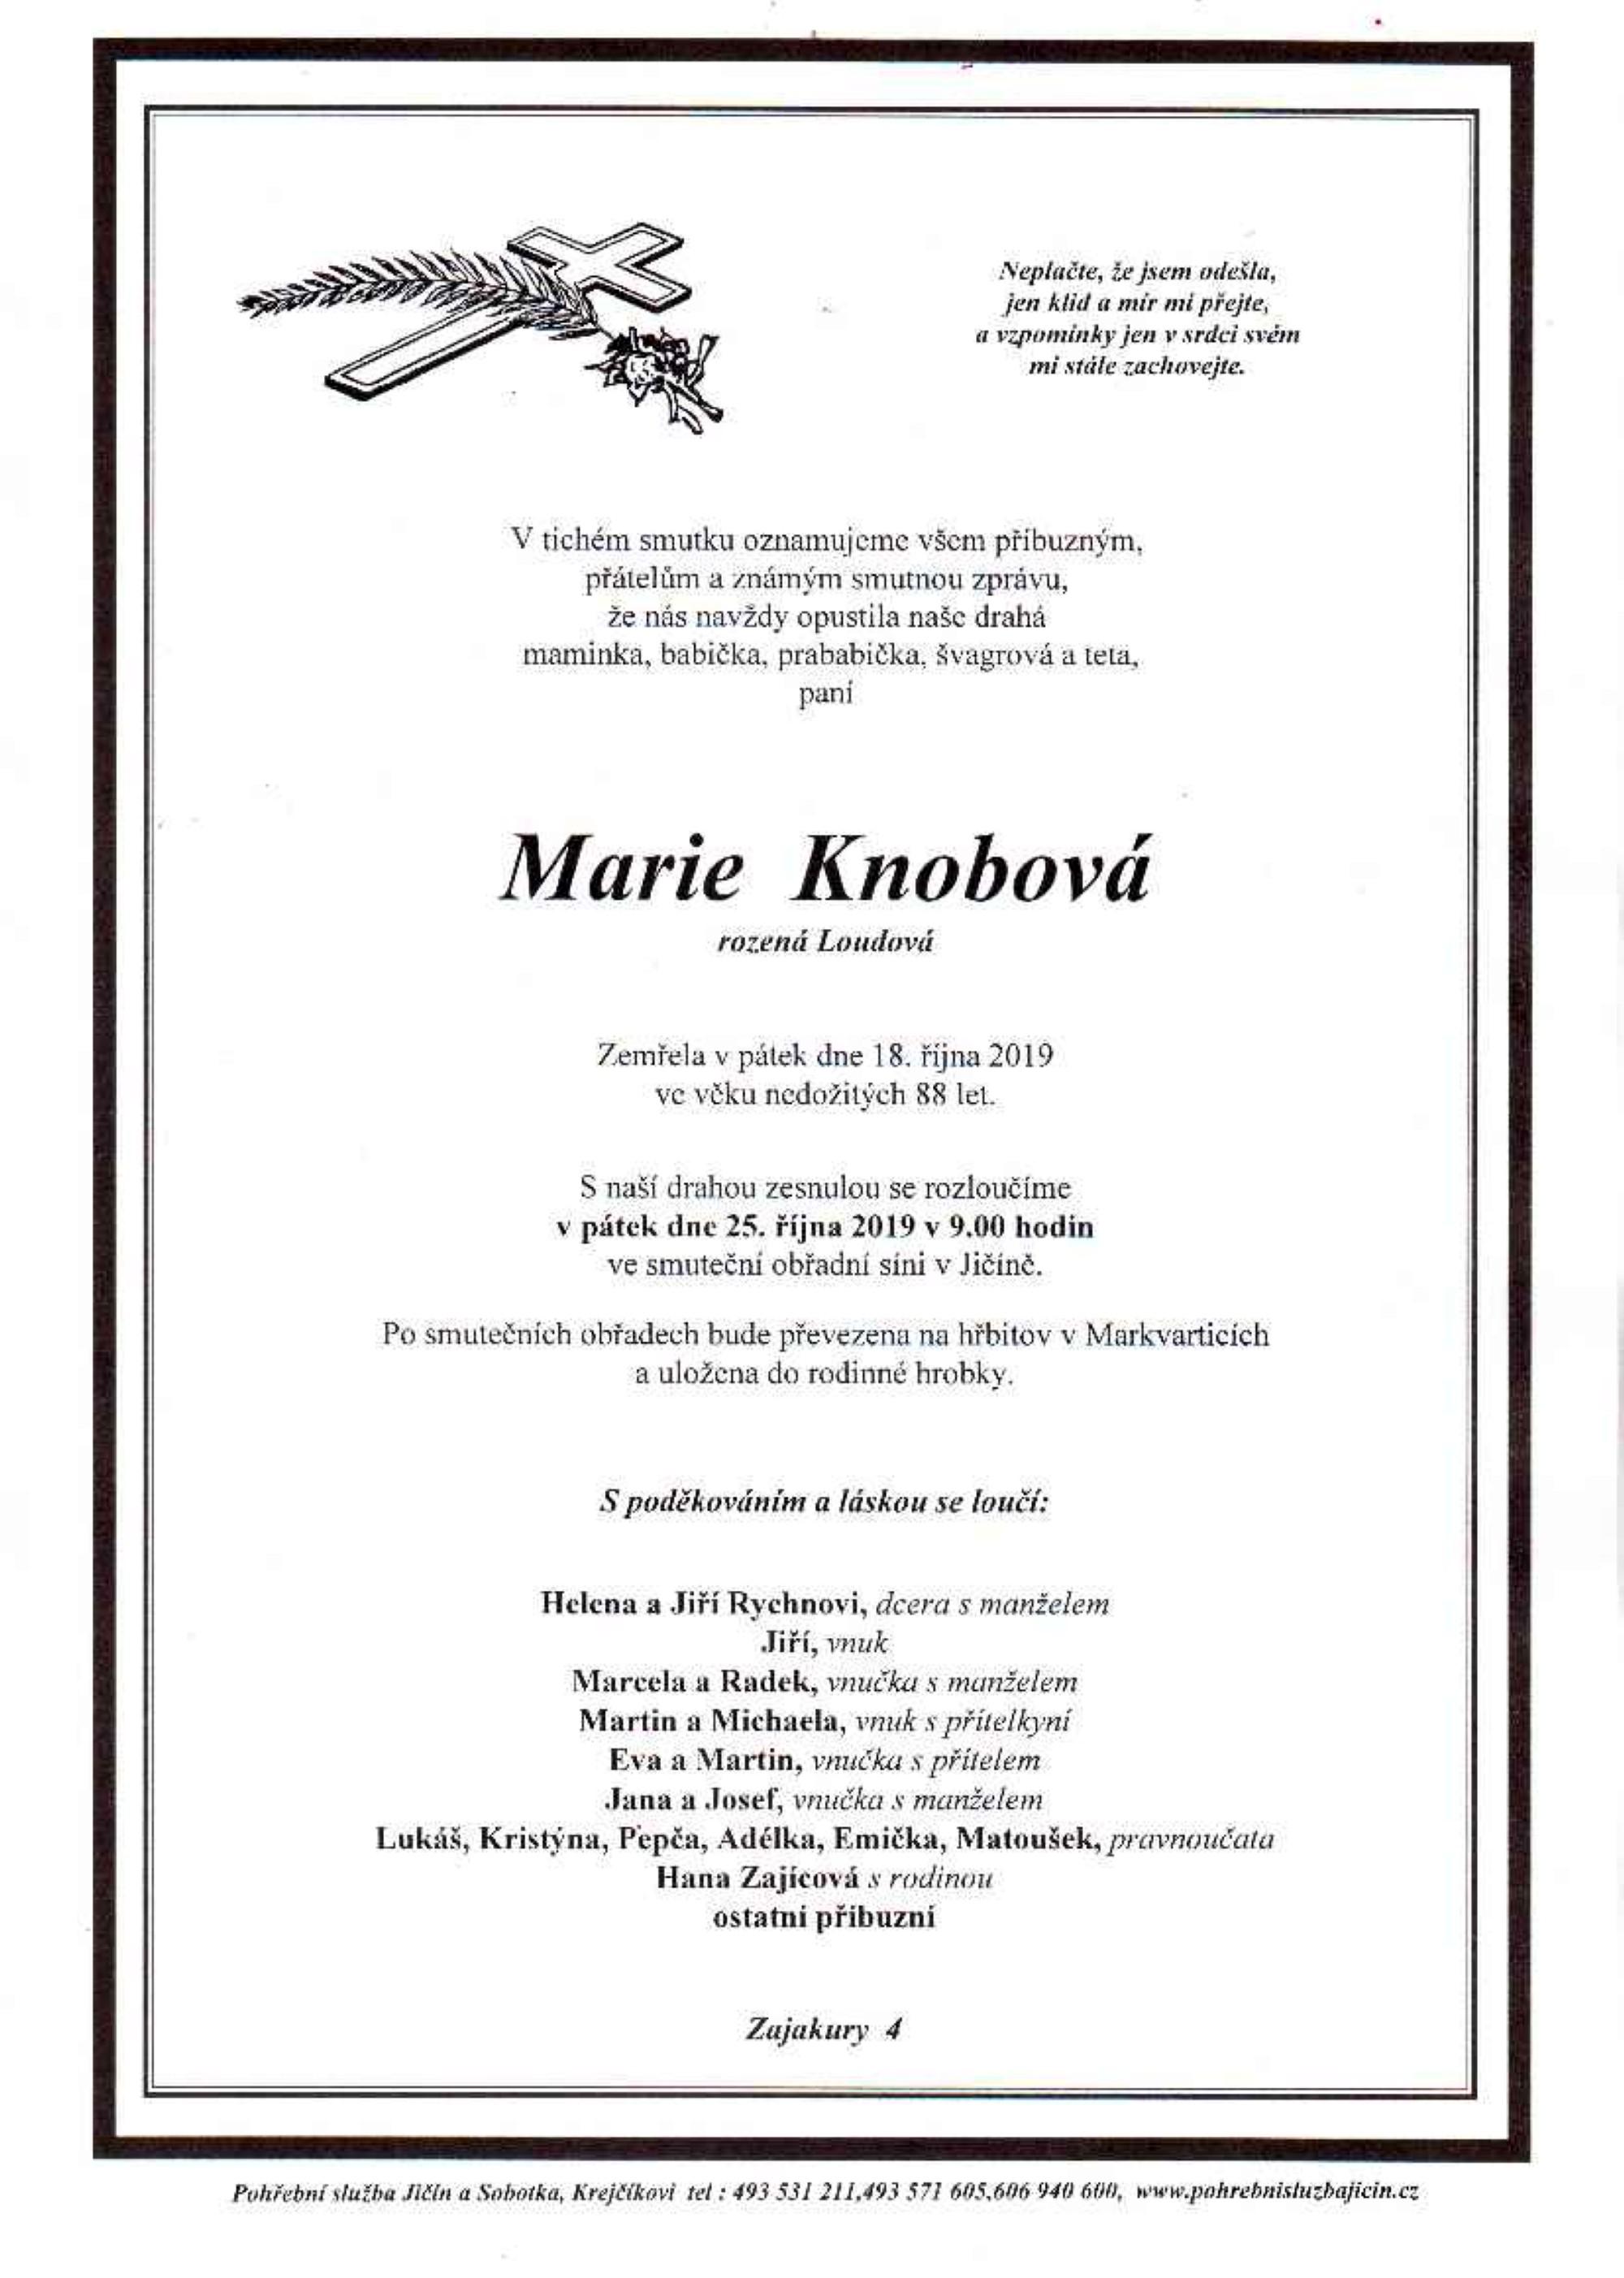 Marie Knobová